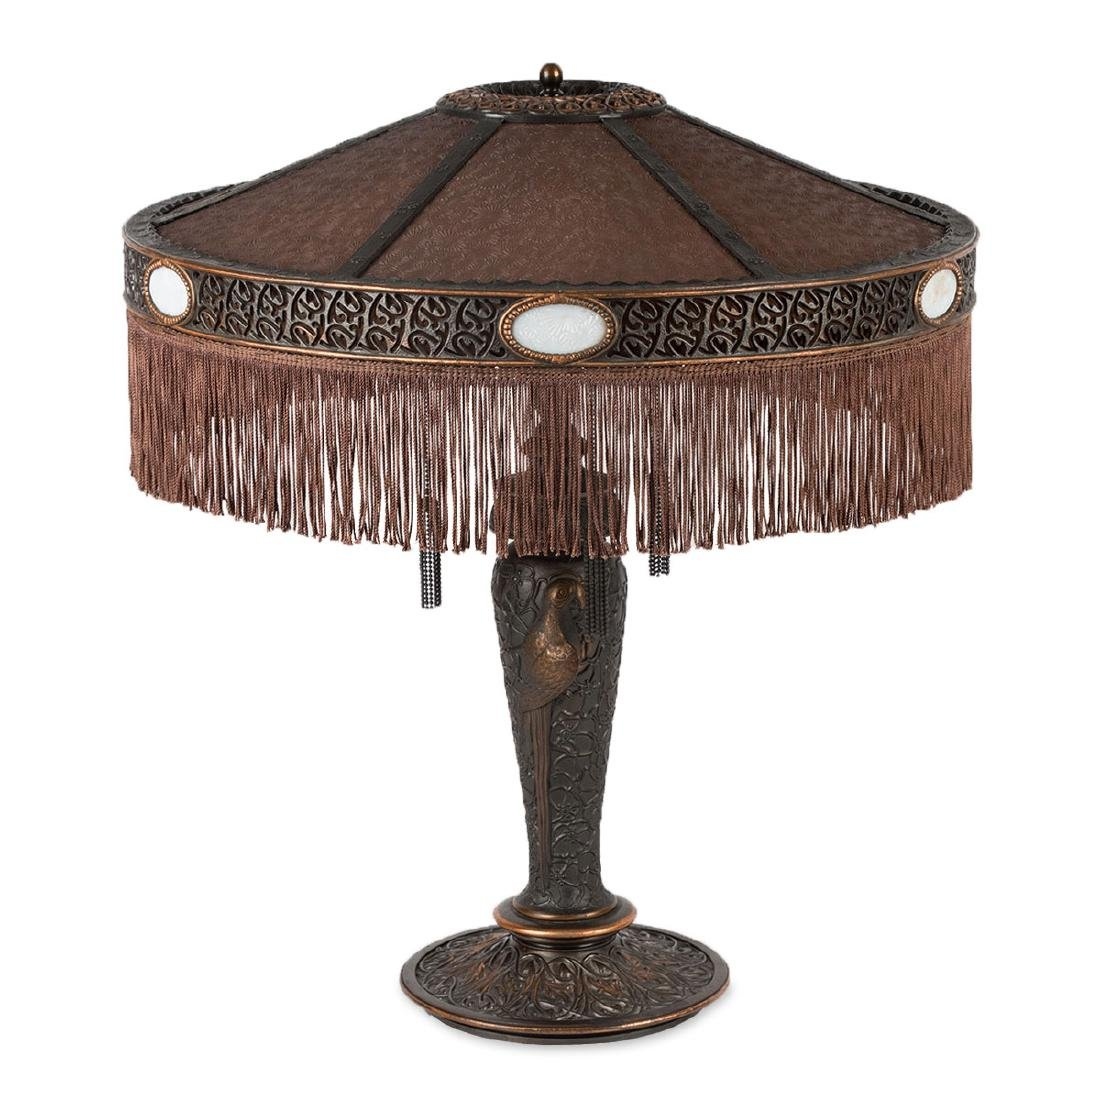 Parrot Motif Table Lamp